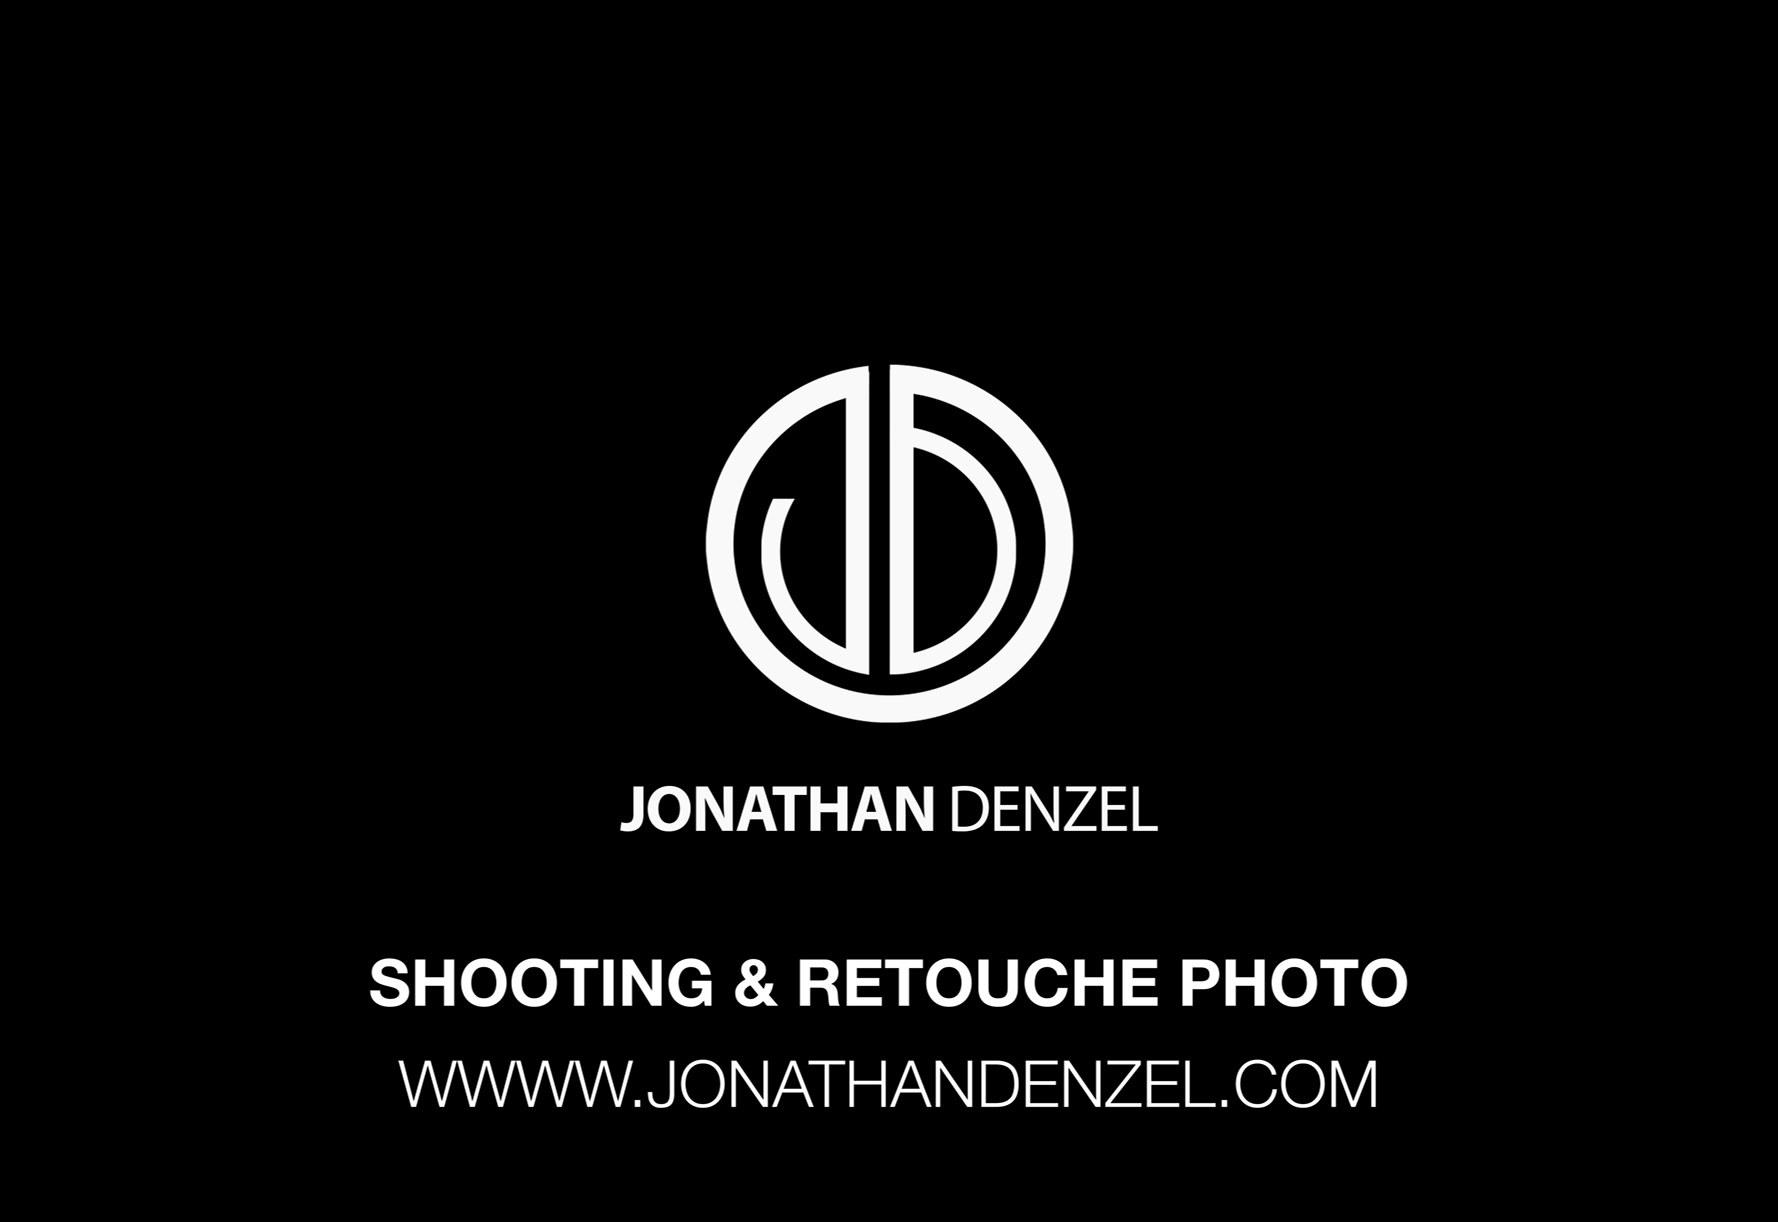 JONATHAN DENZEL -PHOTOGRAPHER - EDITING  - RETOUCHES PHOTOS